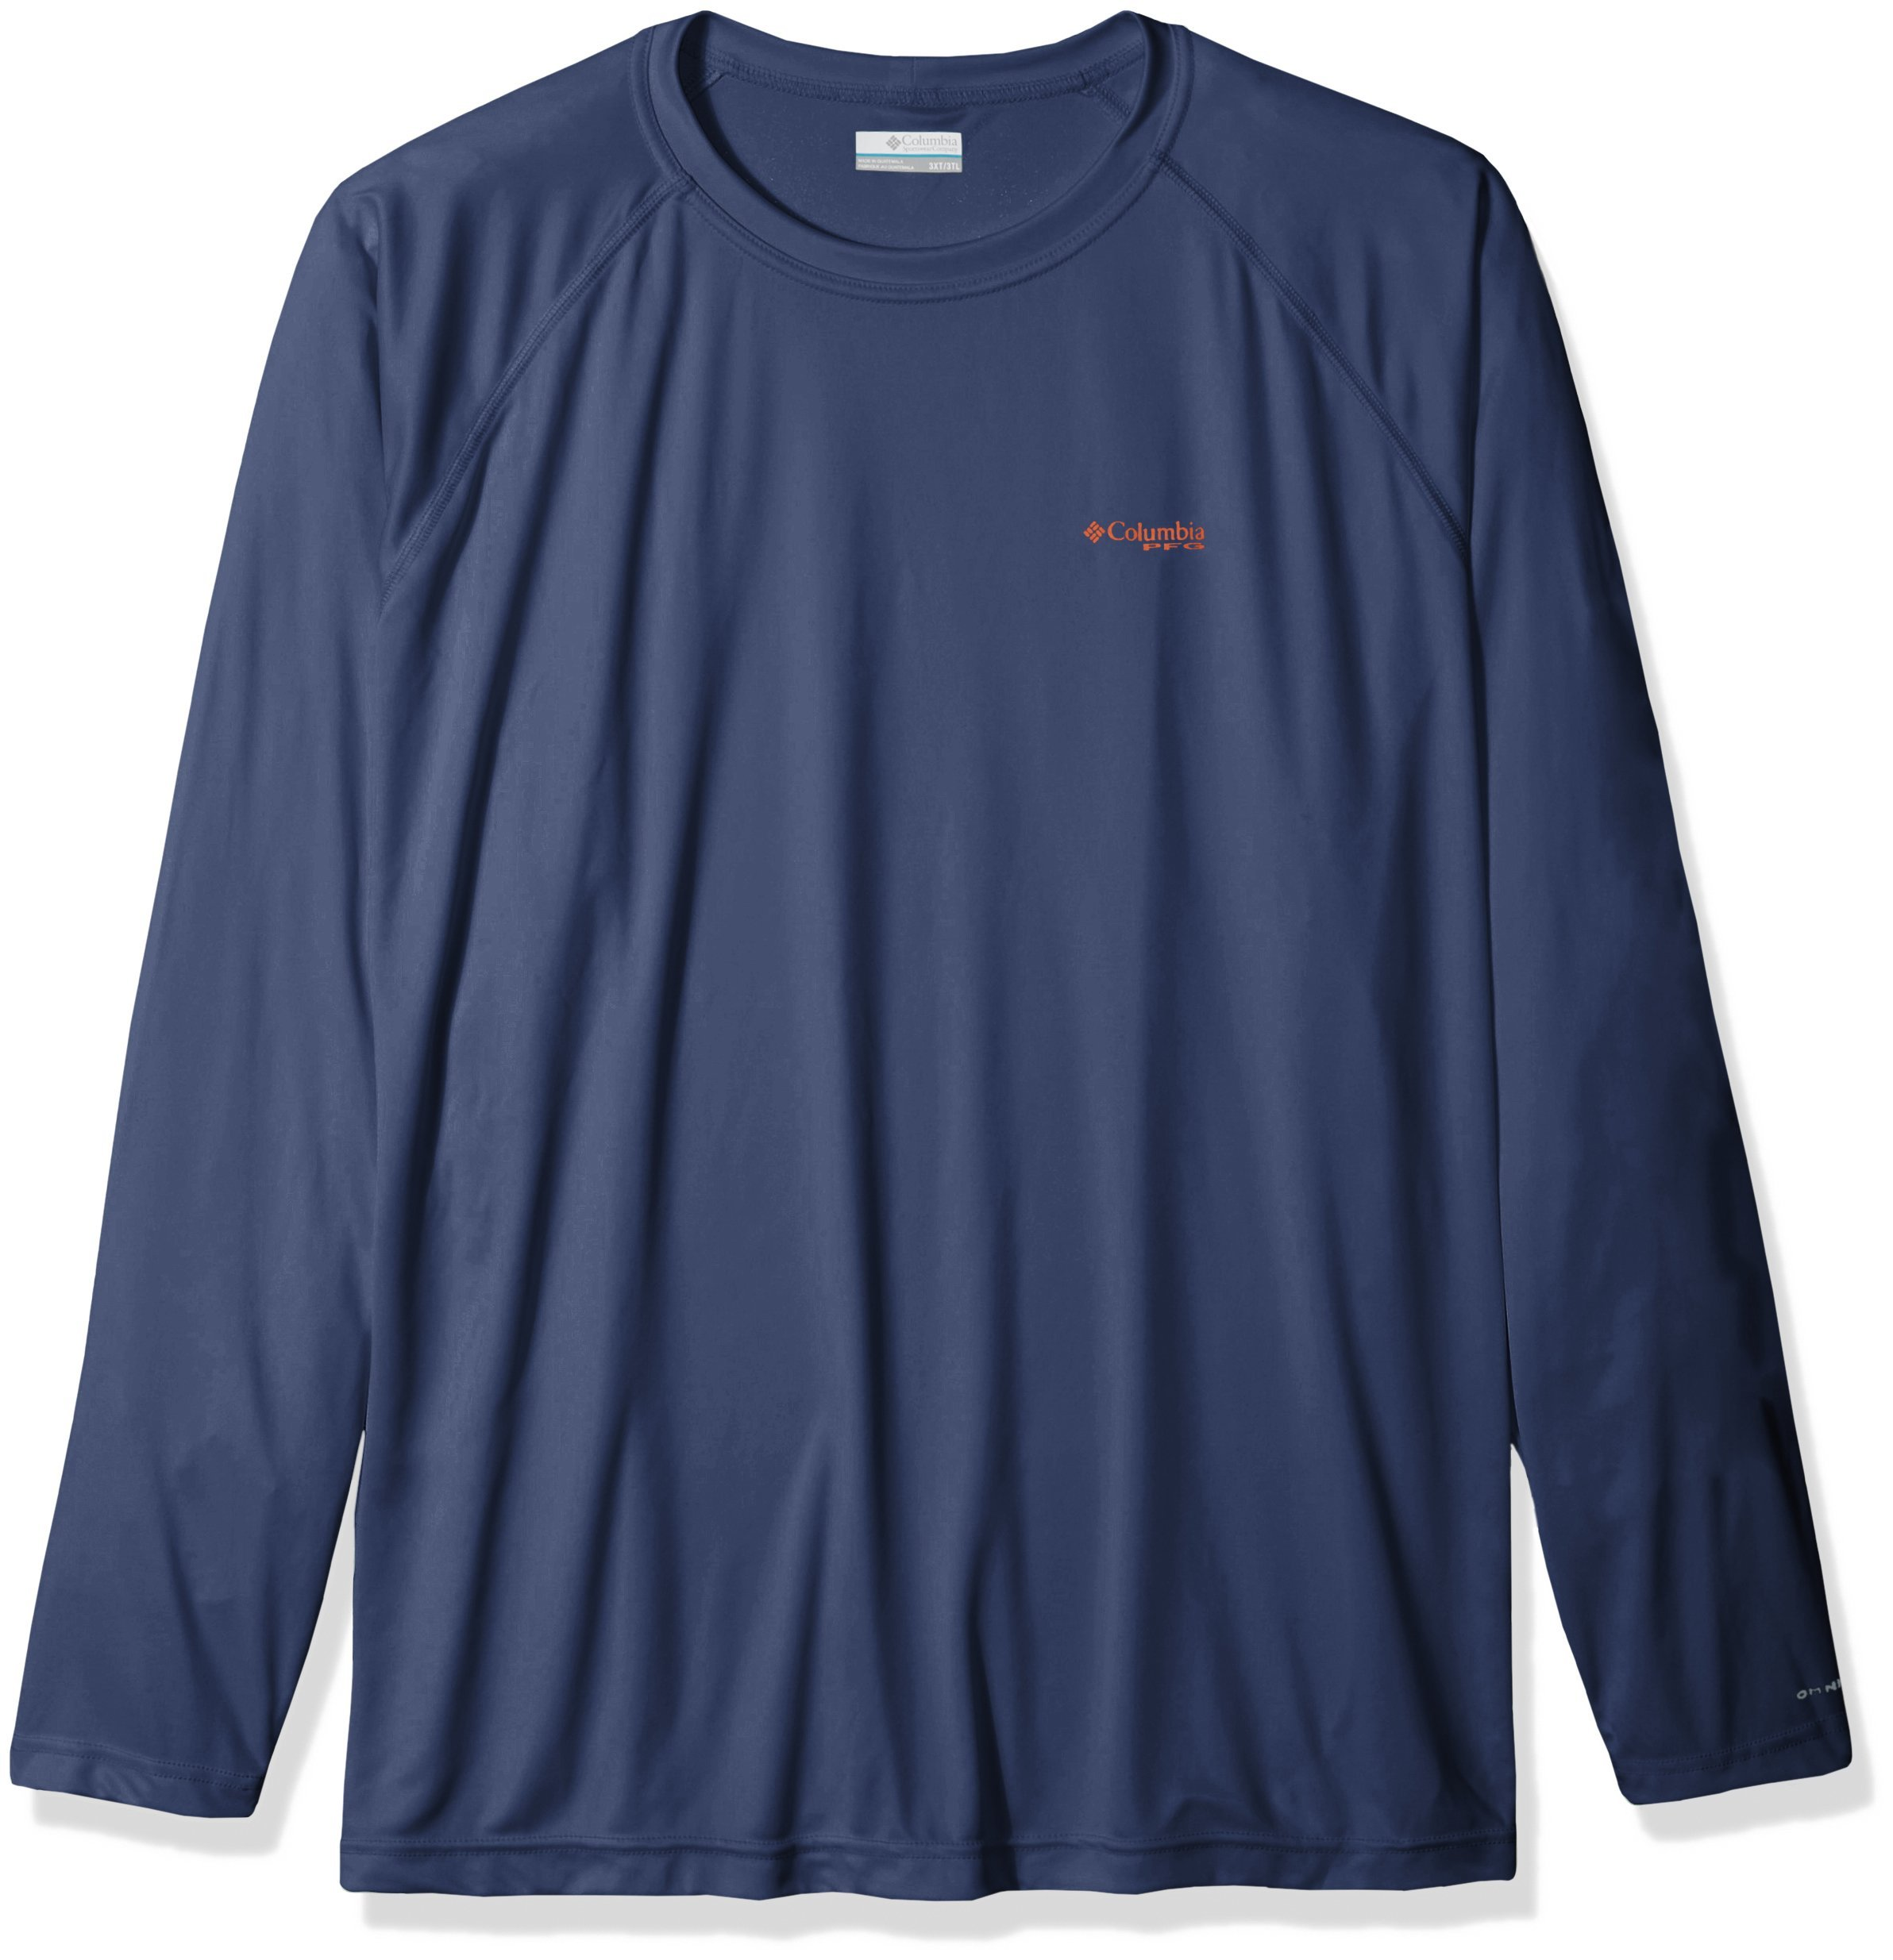 Columbia Men's Terminal Tackle Big & Tall Long Sleeve Shirt, Dark MTN, Backcountry Orange L, 4X